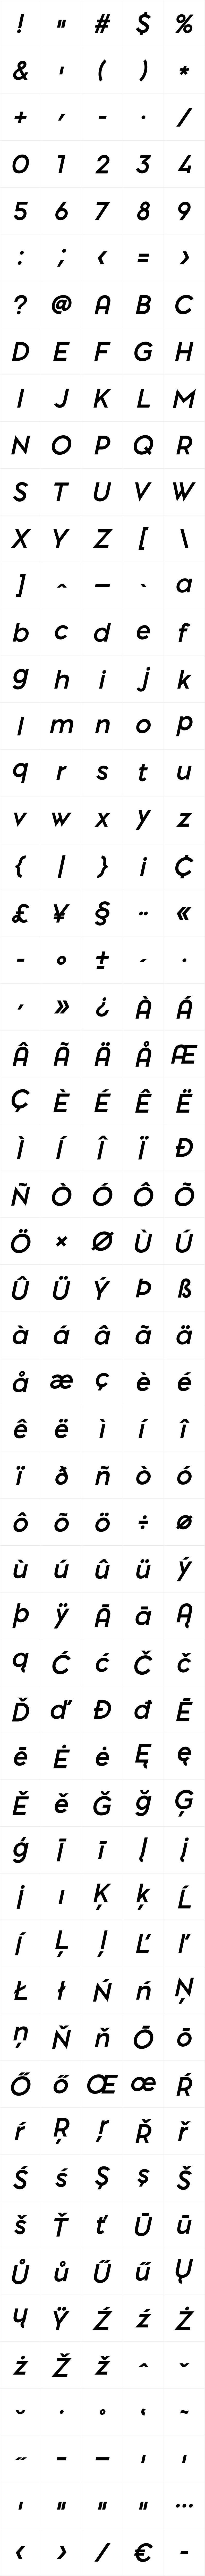 pontiac bold italic